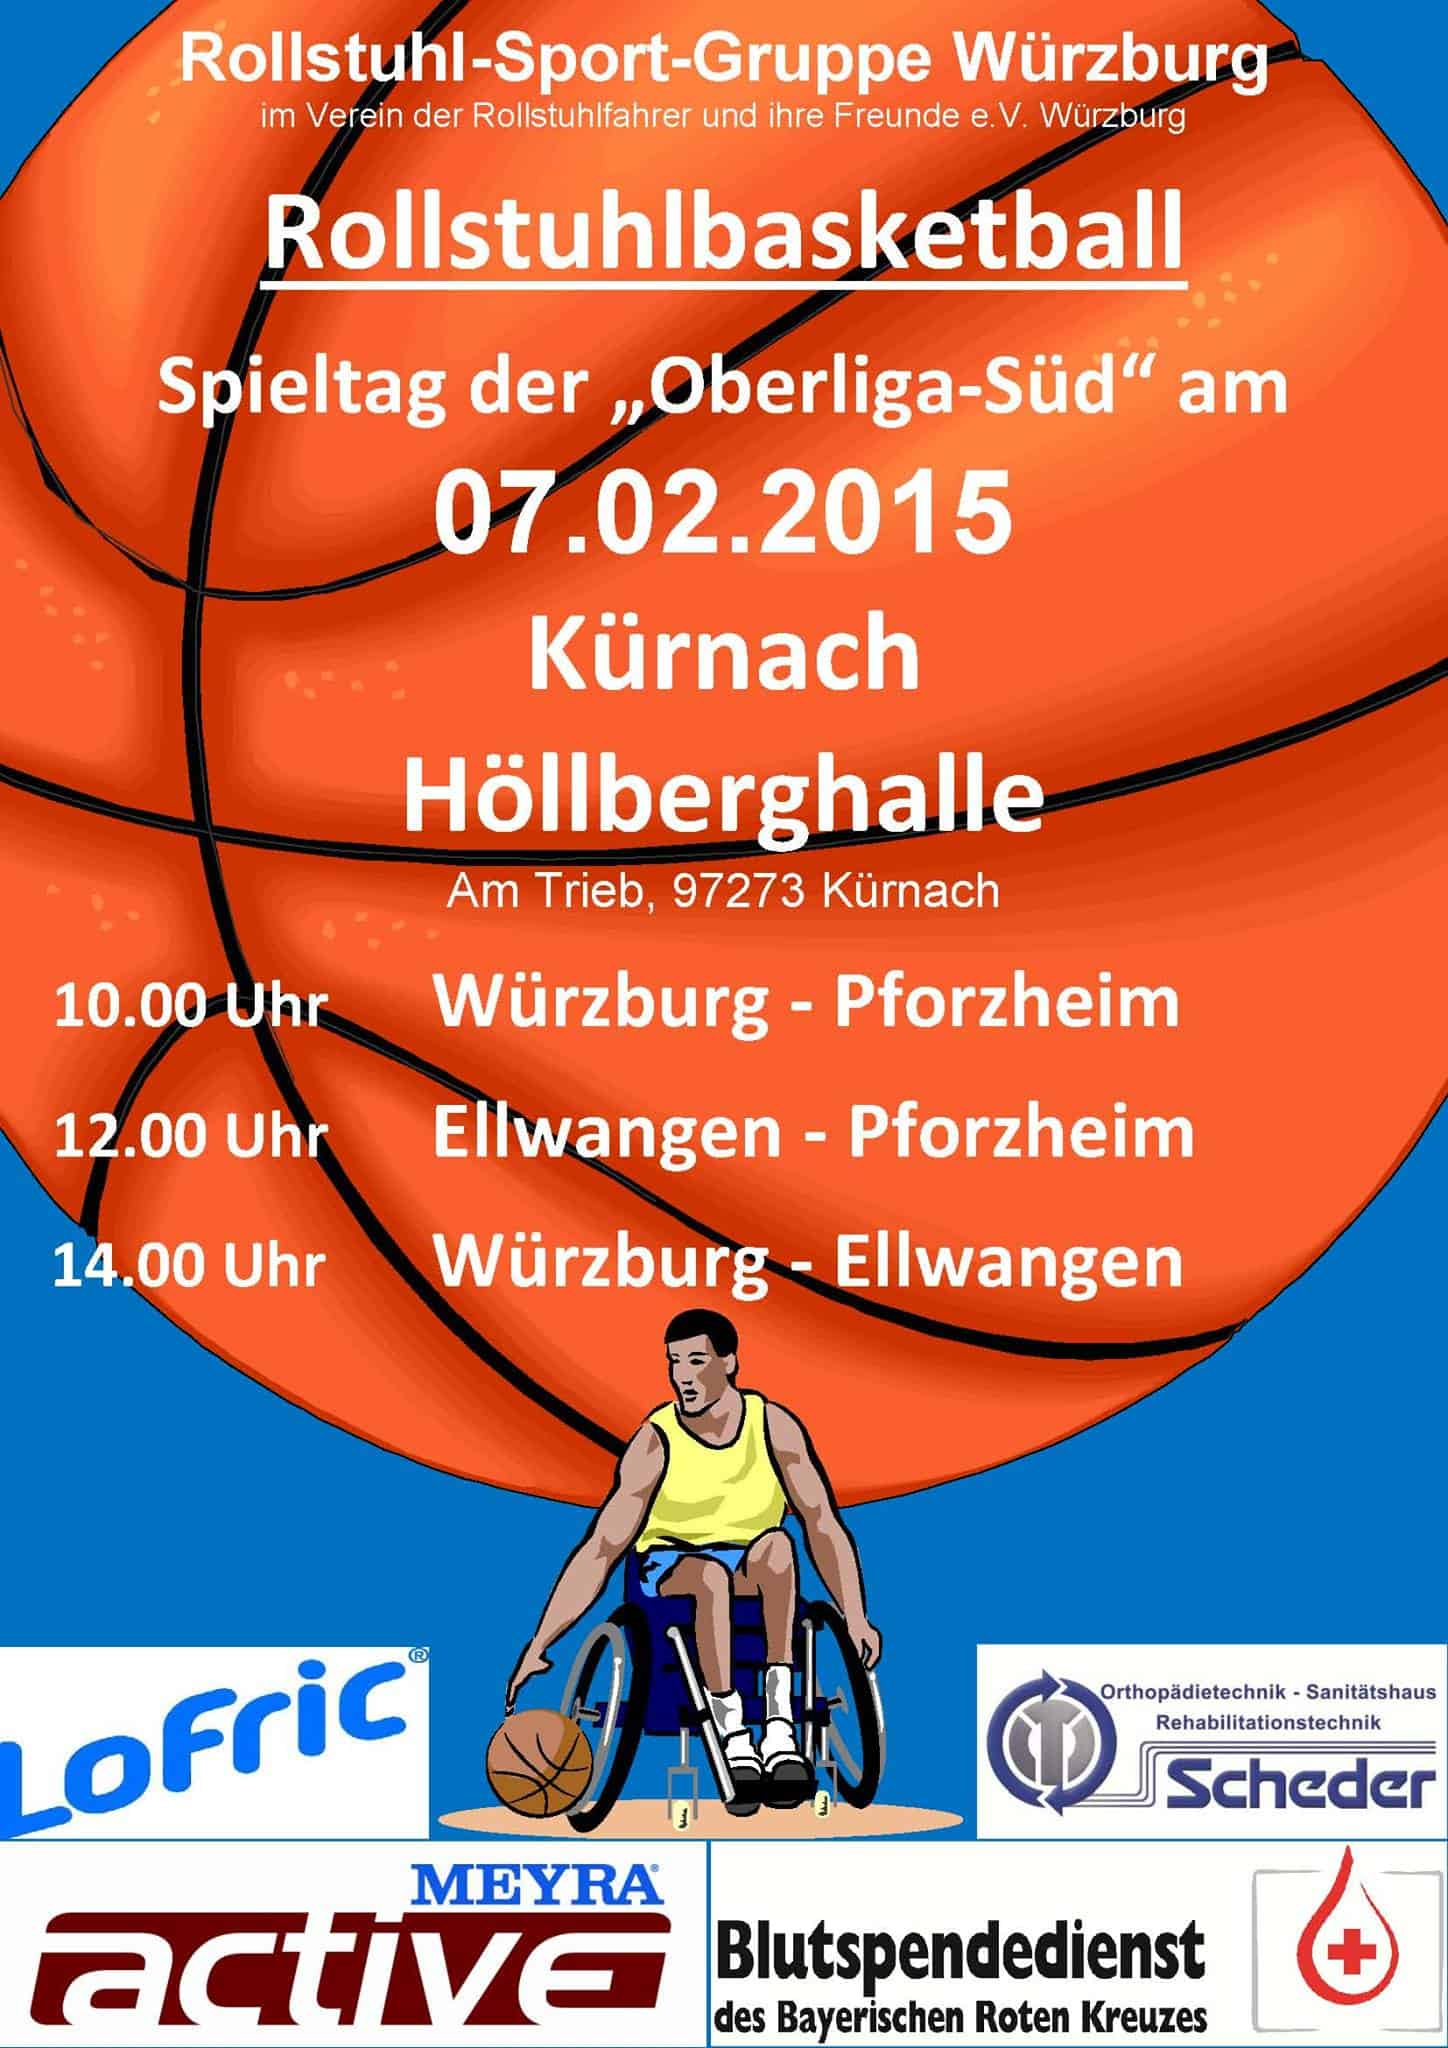 Rollstuhlbasketball in Kürnach, 7.2.15